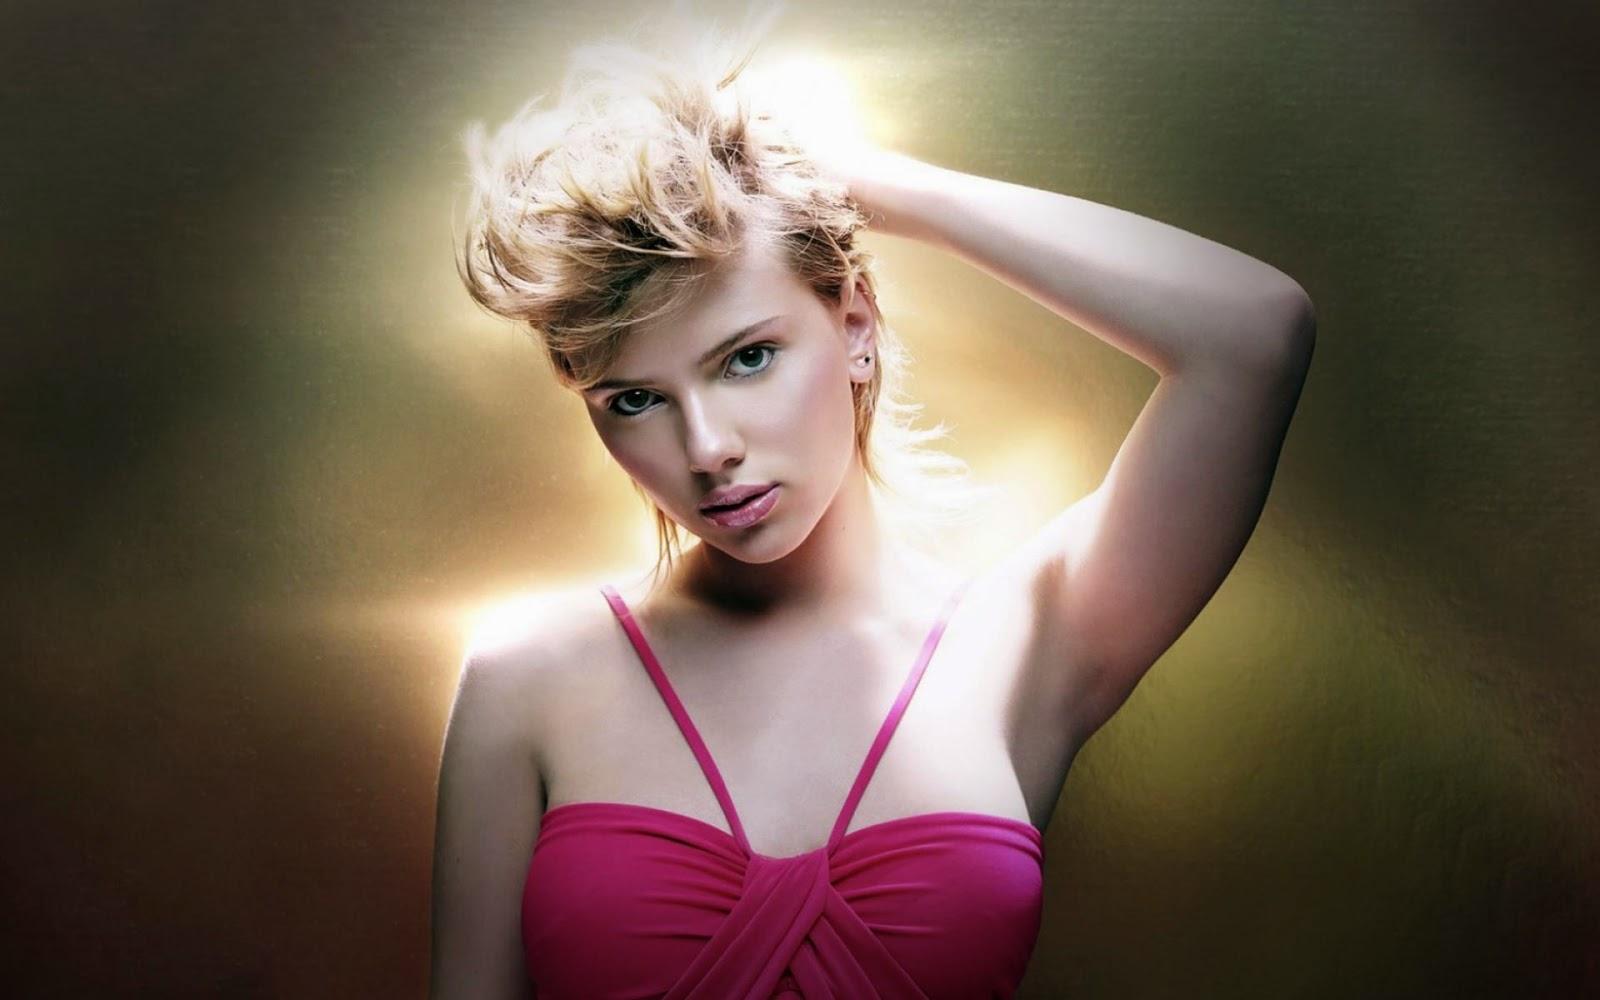 Wallpaper Scarlett Johansson HD